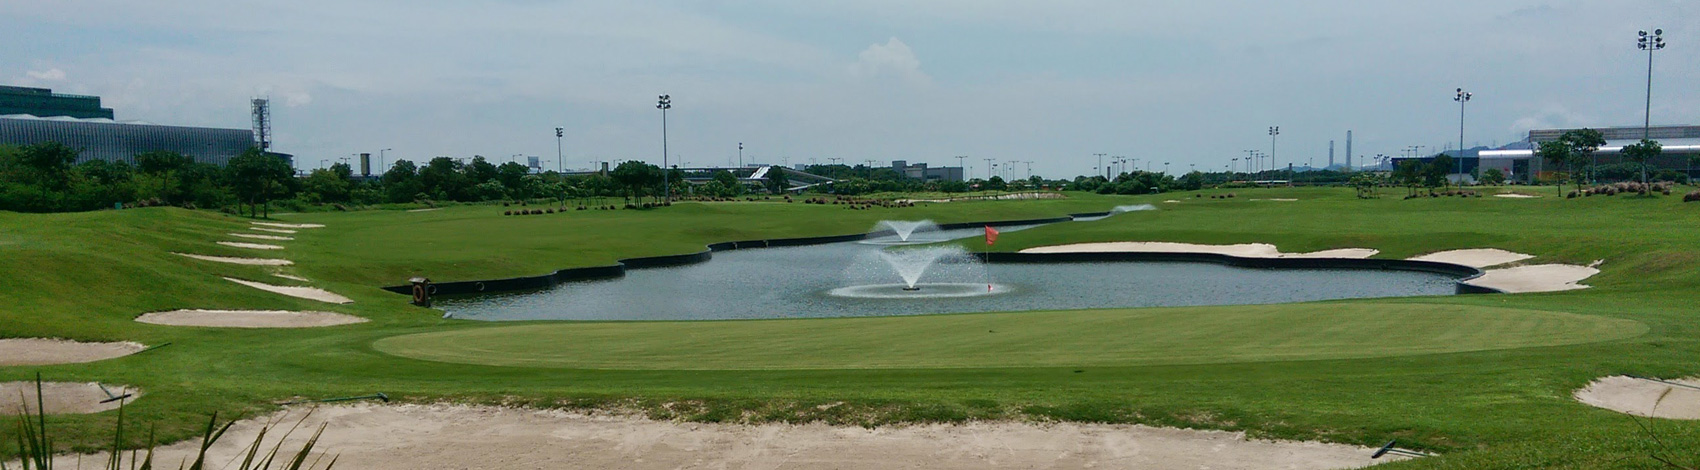 Sky City Nine Eagles Golf Course